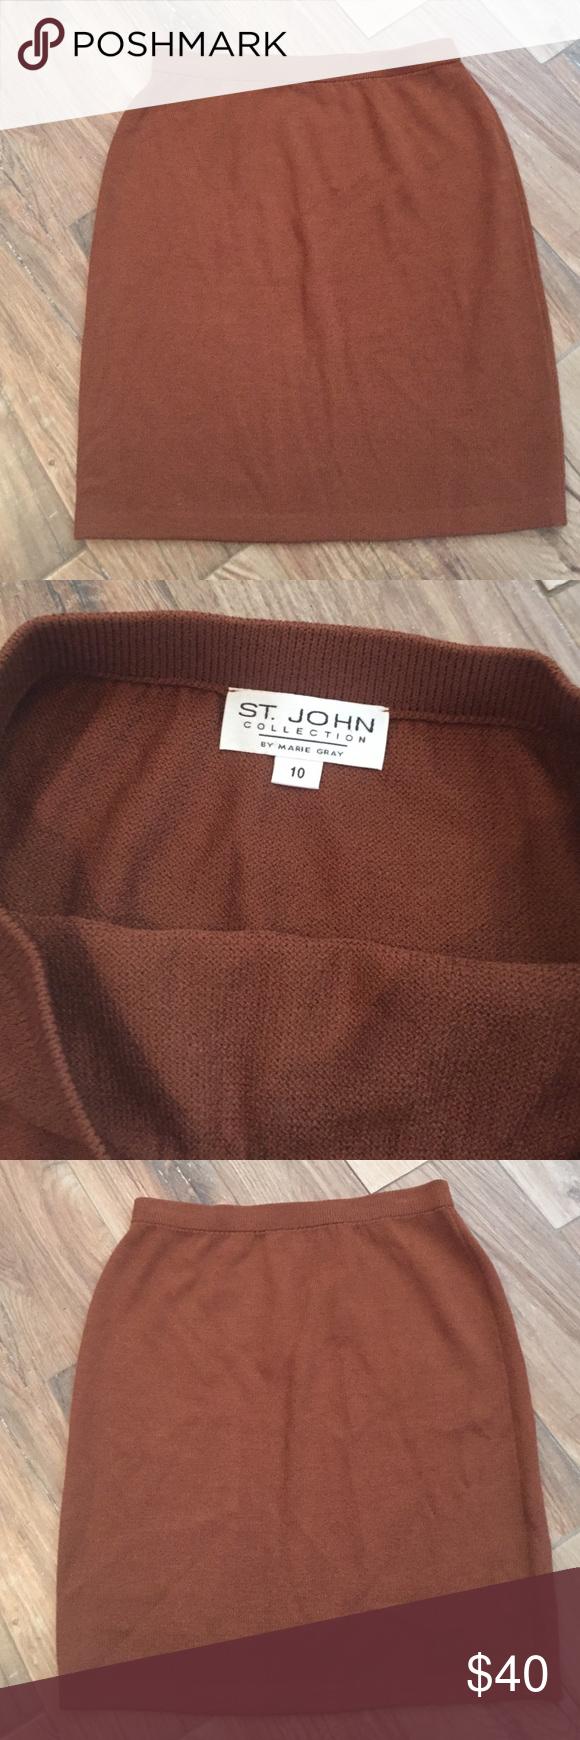 St. John collection Mint condition knit St. John collection skirt. 21.5 inches long St. John Skirts